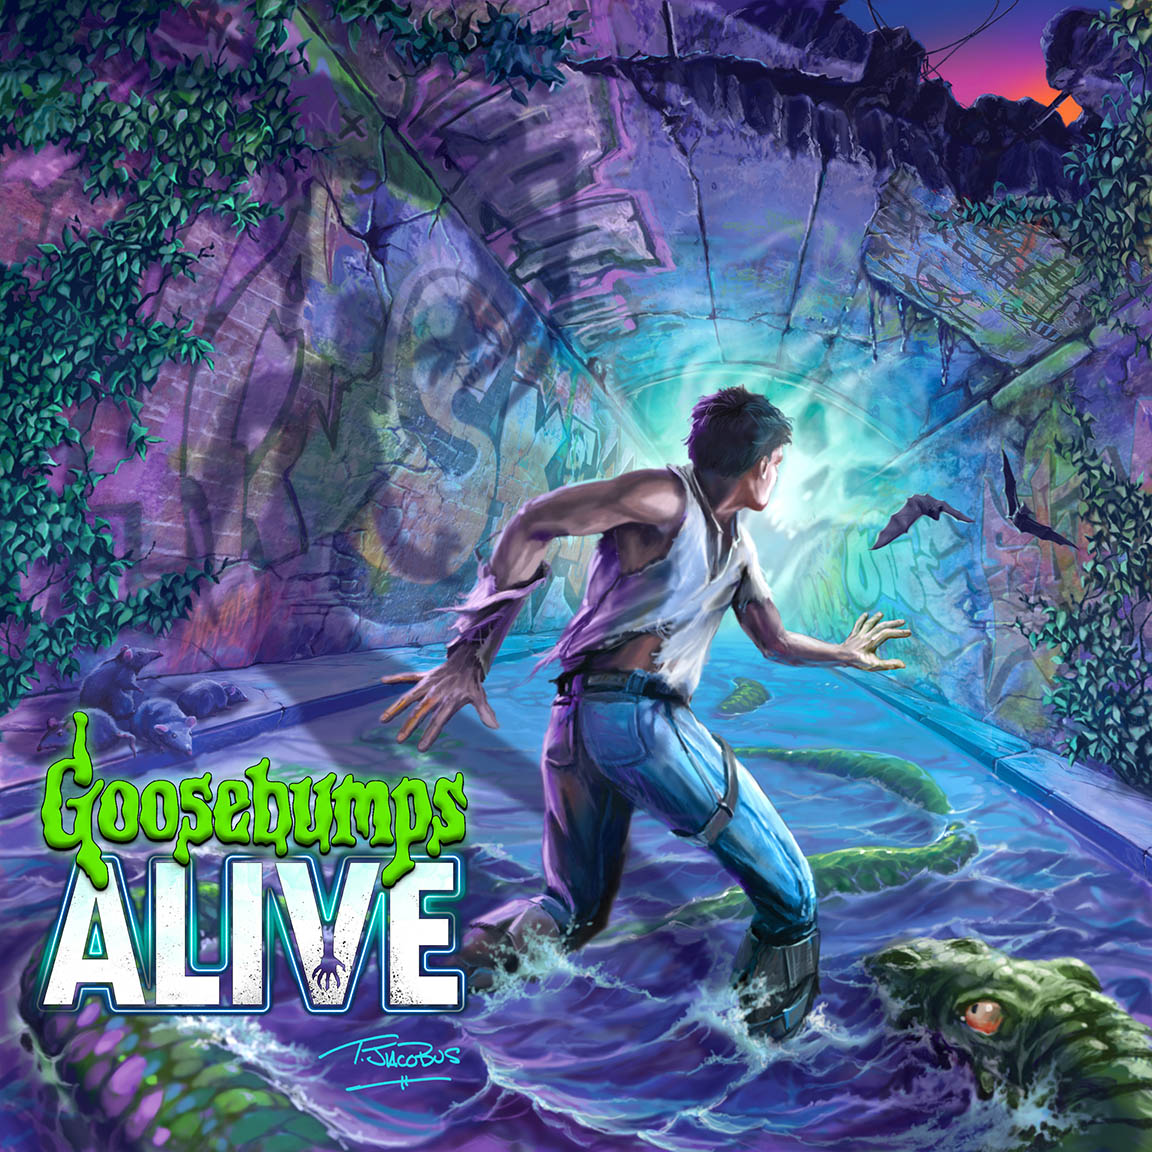 Goosebumps Live at the Vault